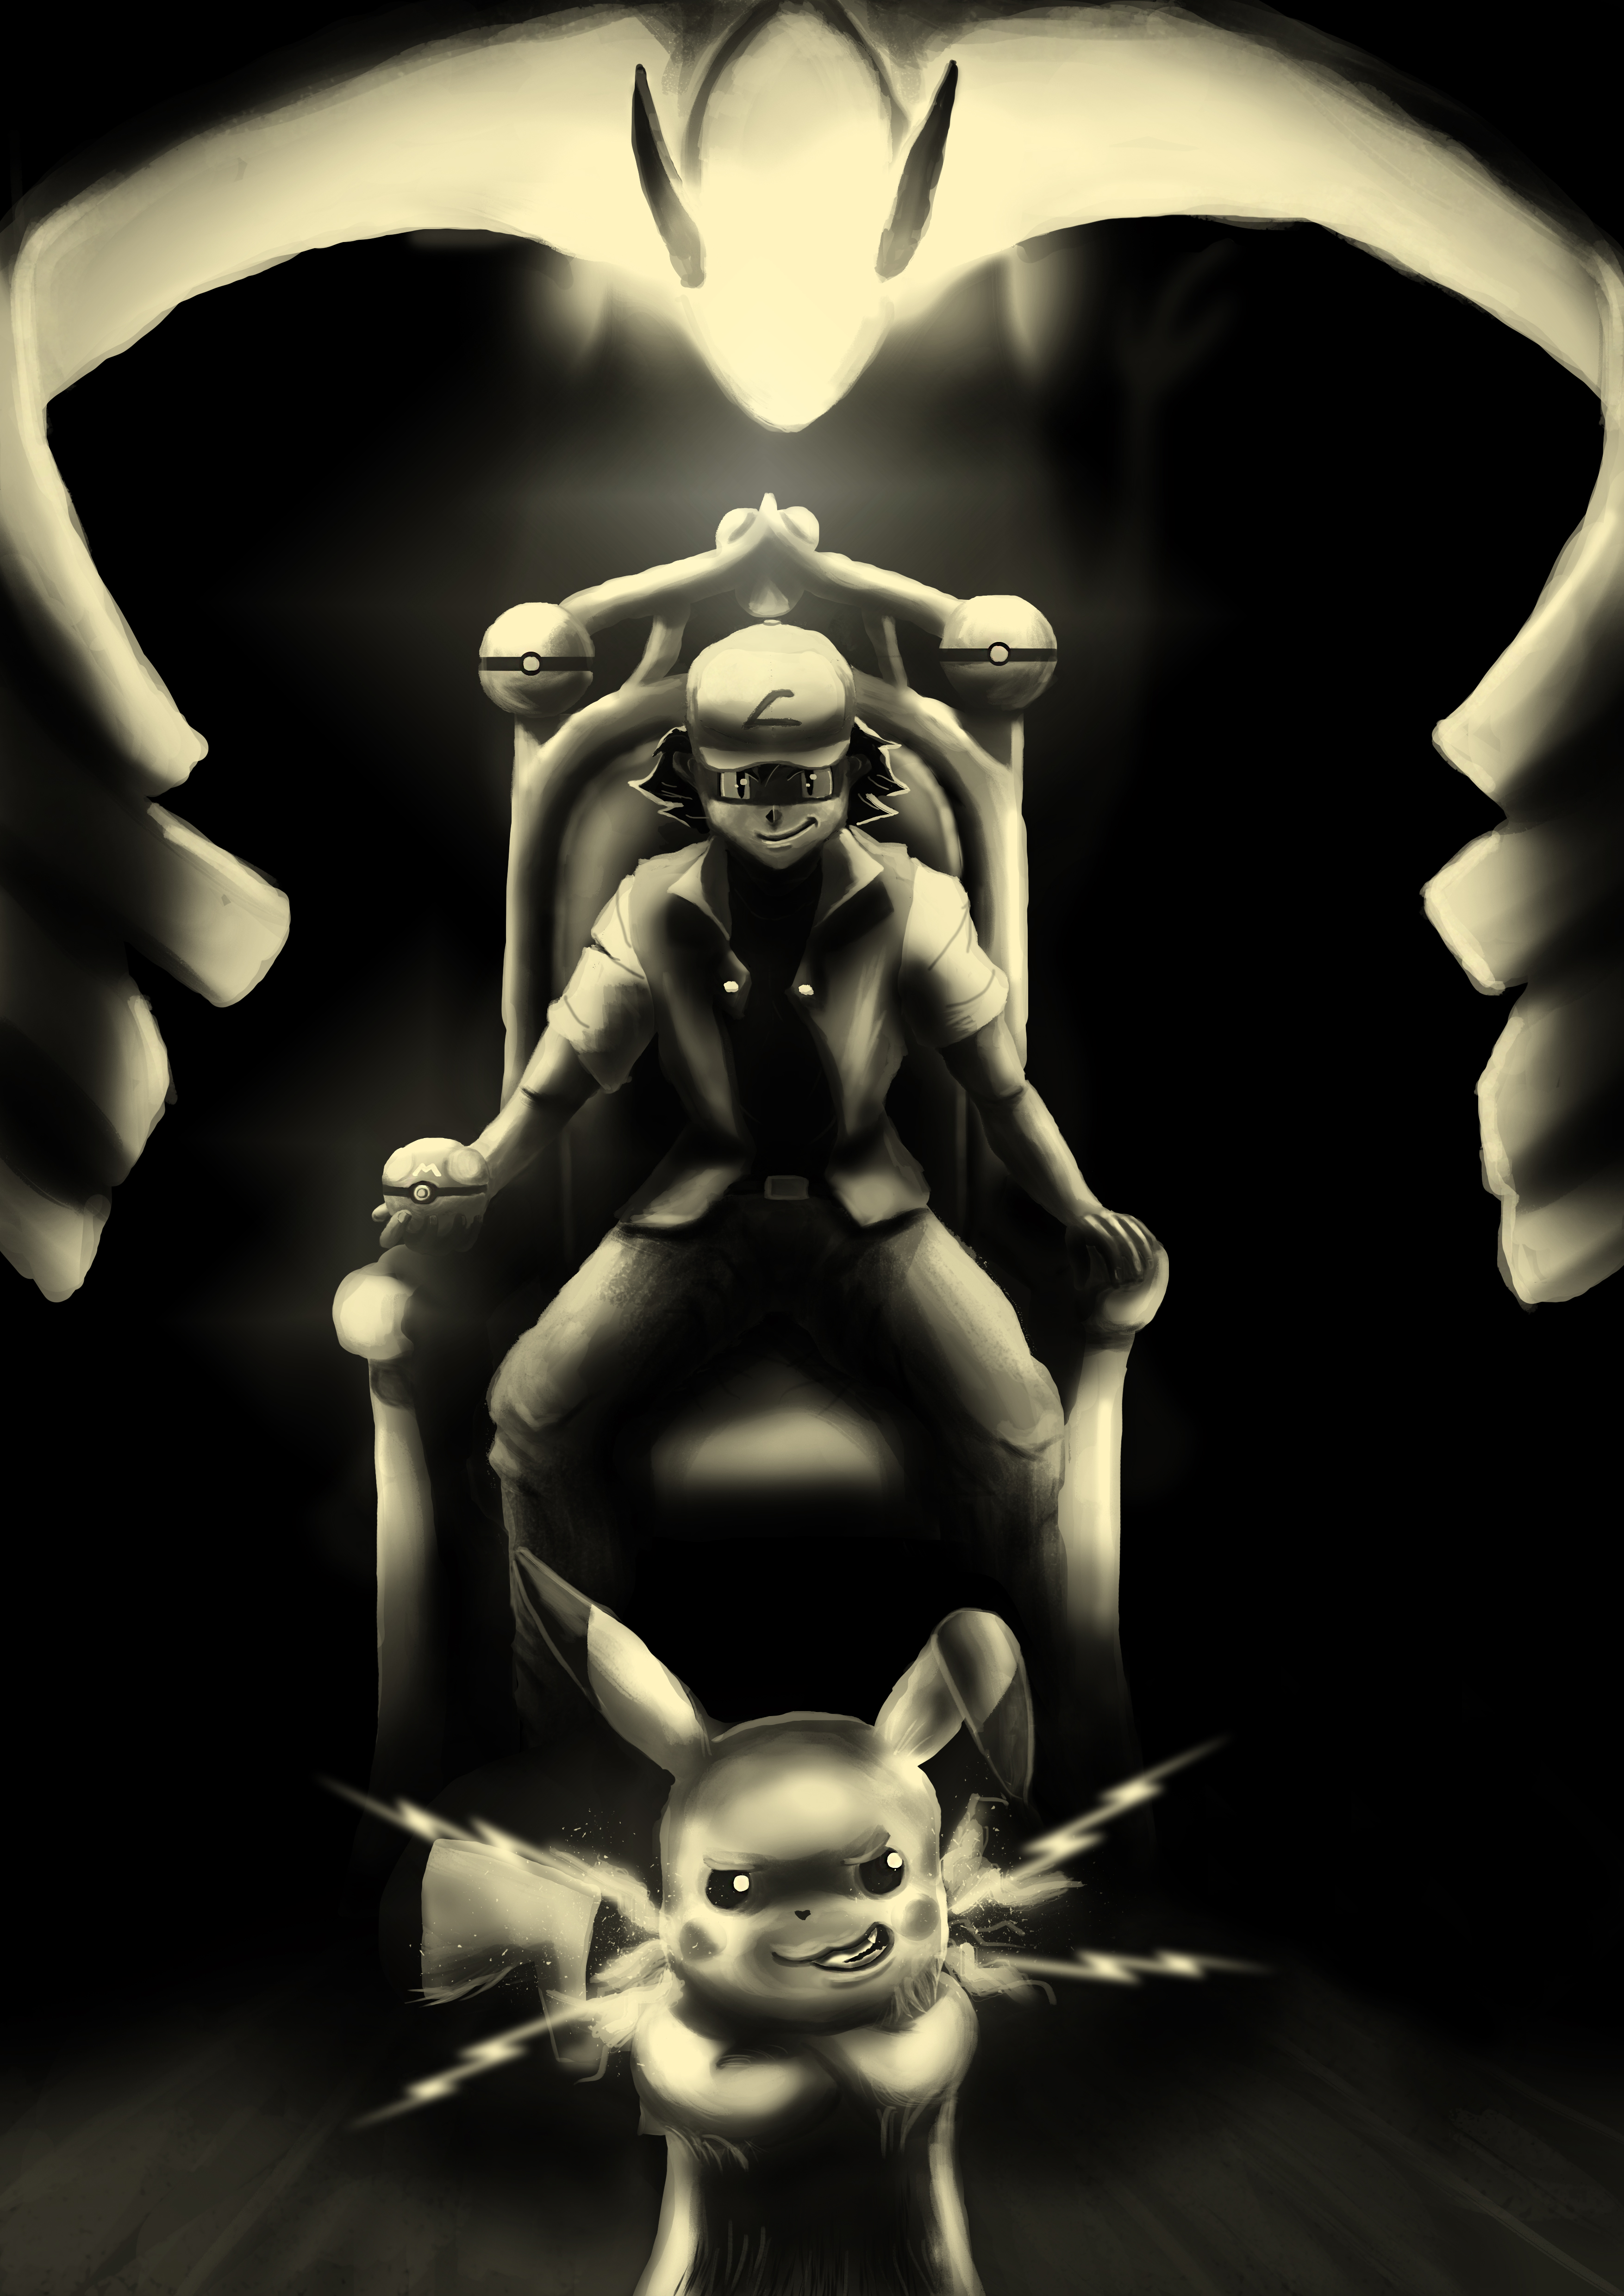 Ash Ketchum, Pokemon master!